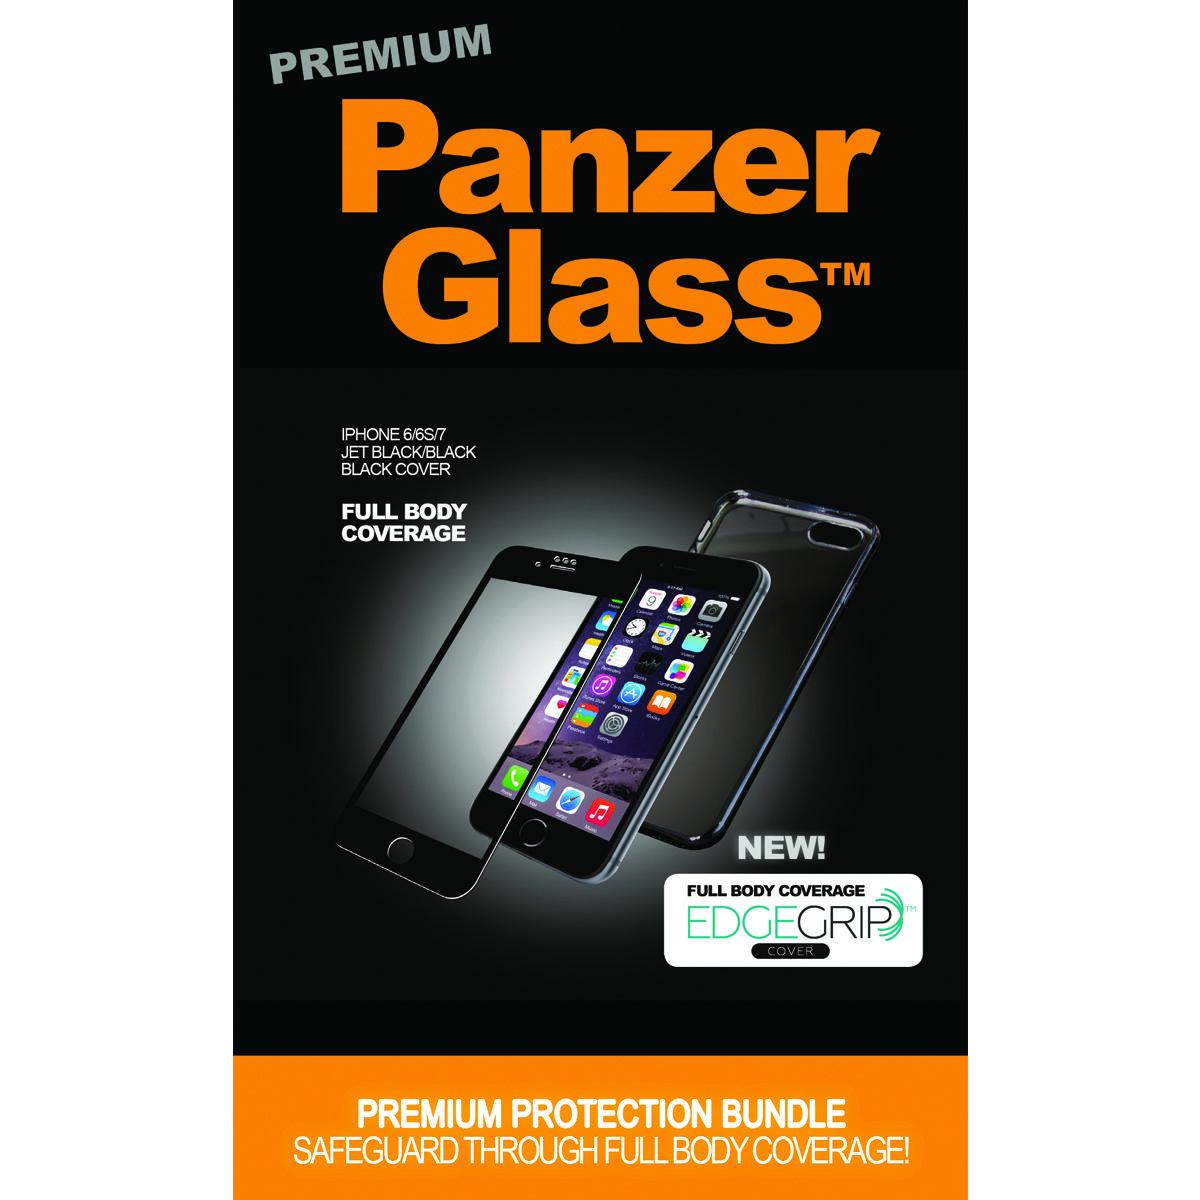 PanzerGlass B2614 mobile phone case Cover Black,Transparent